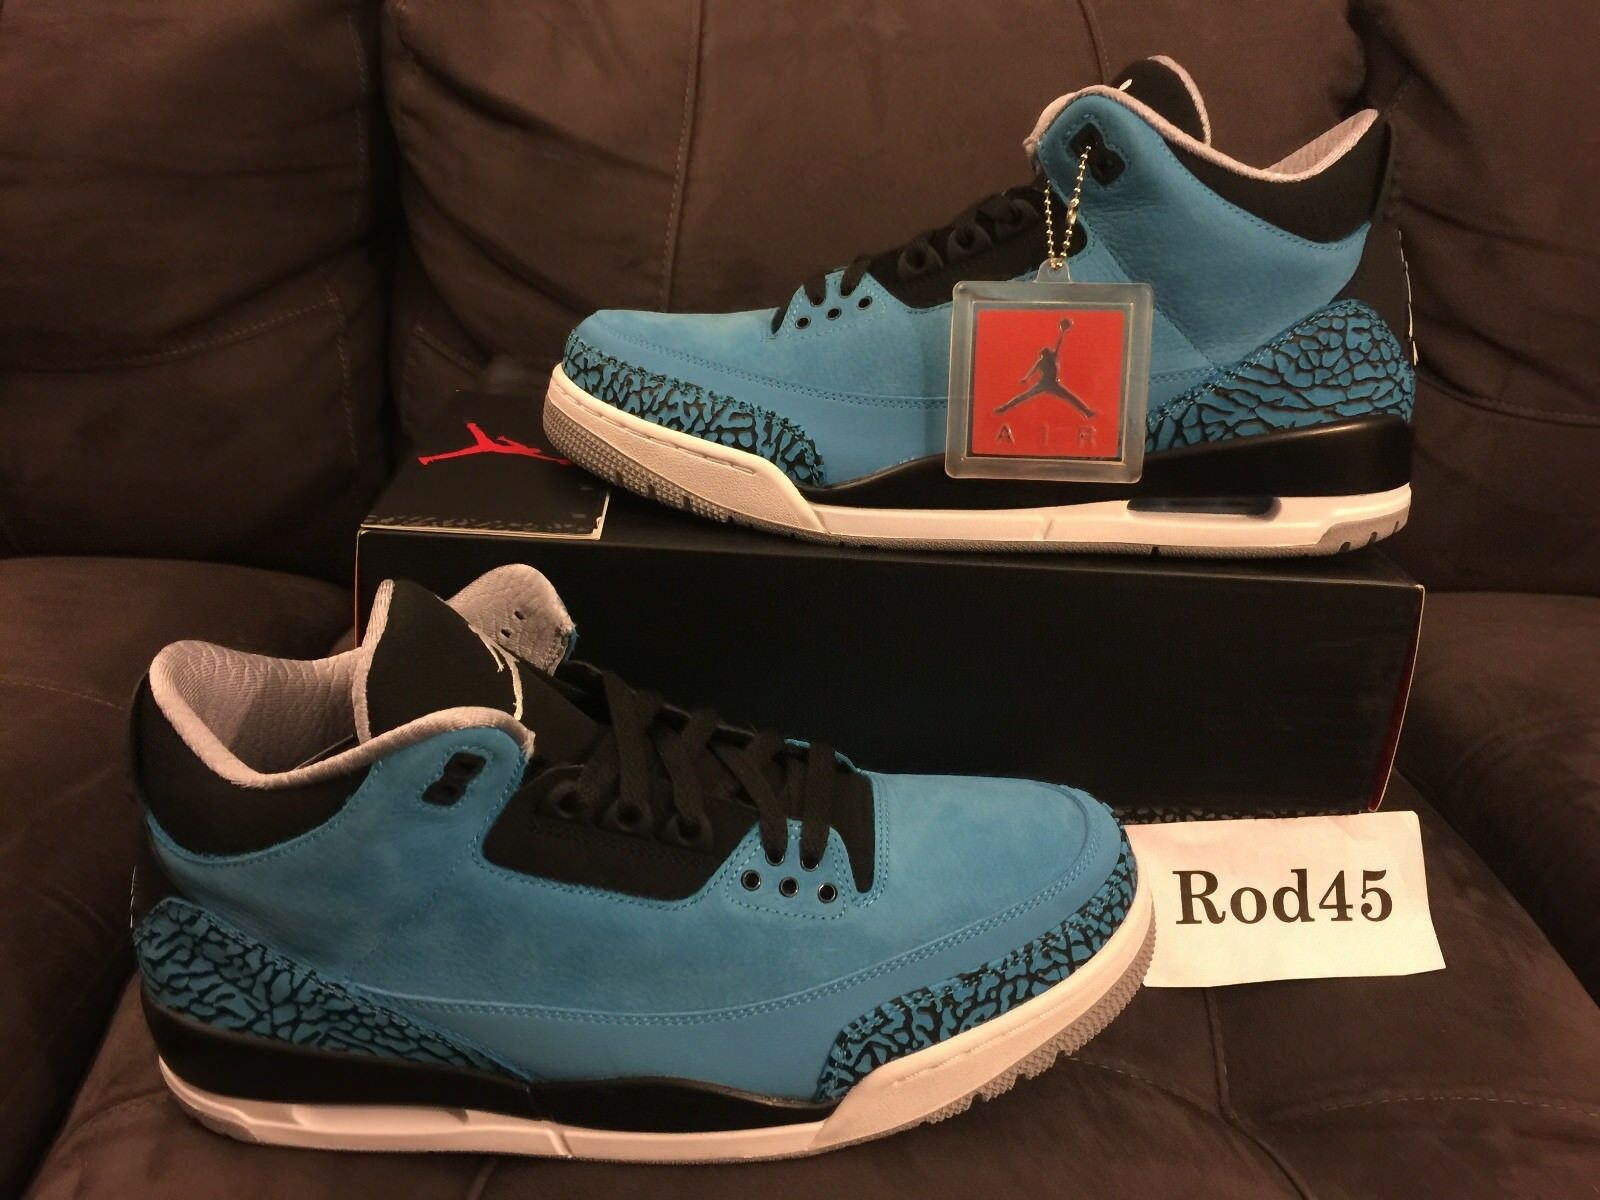 9a79e9790e2d Nike Air Jordan 3 III Grey Retro Powder Blue White Black Grey III 12 DS  4935dd